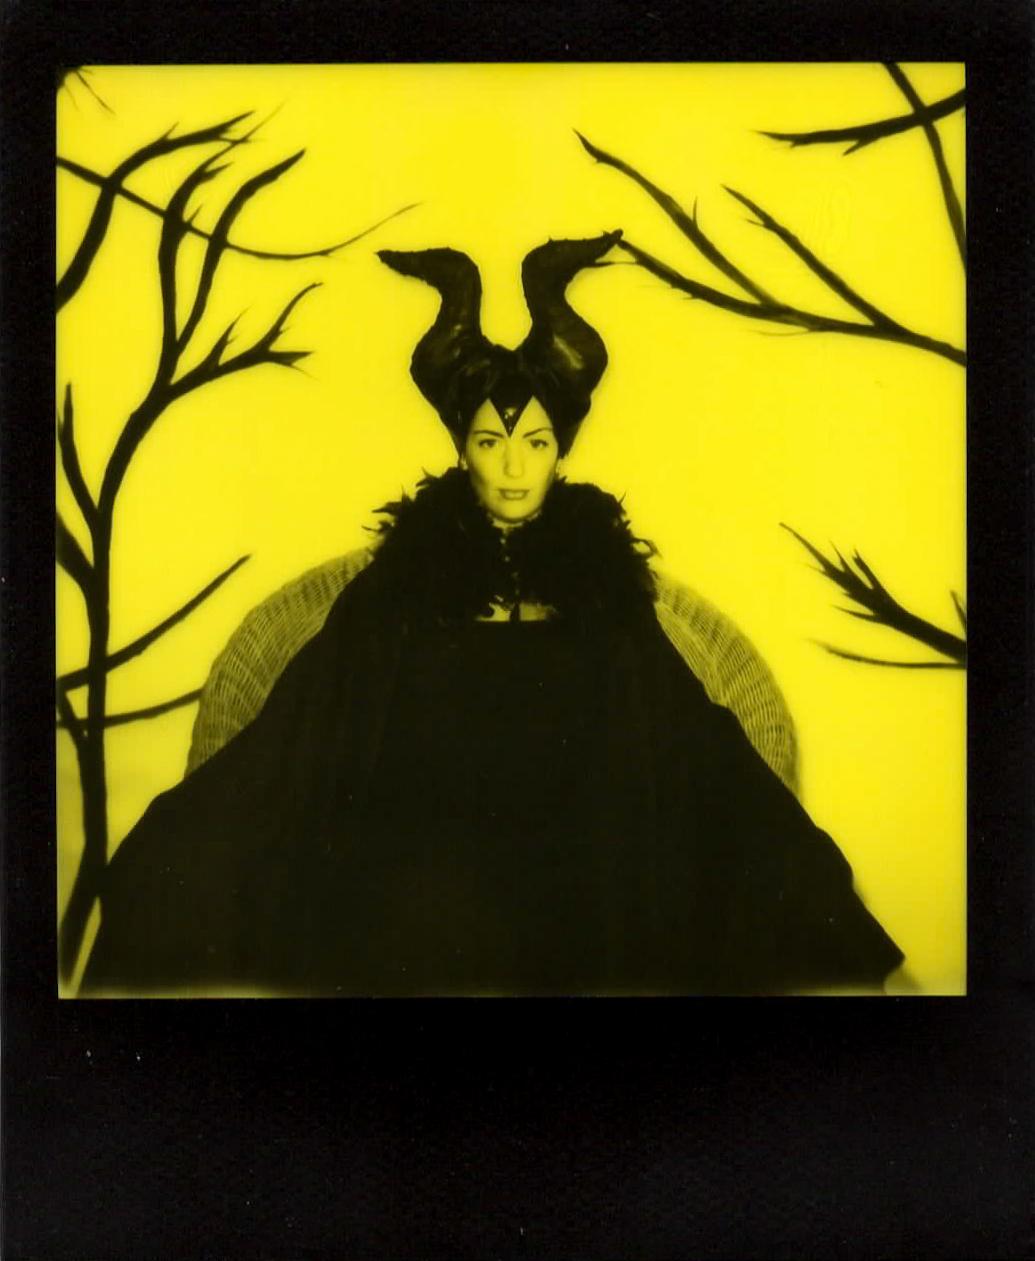 Magnificent Maleficent